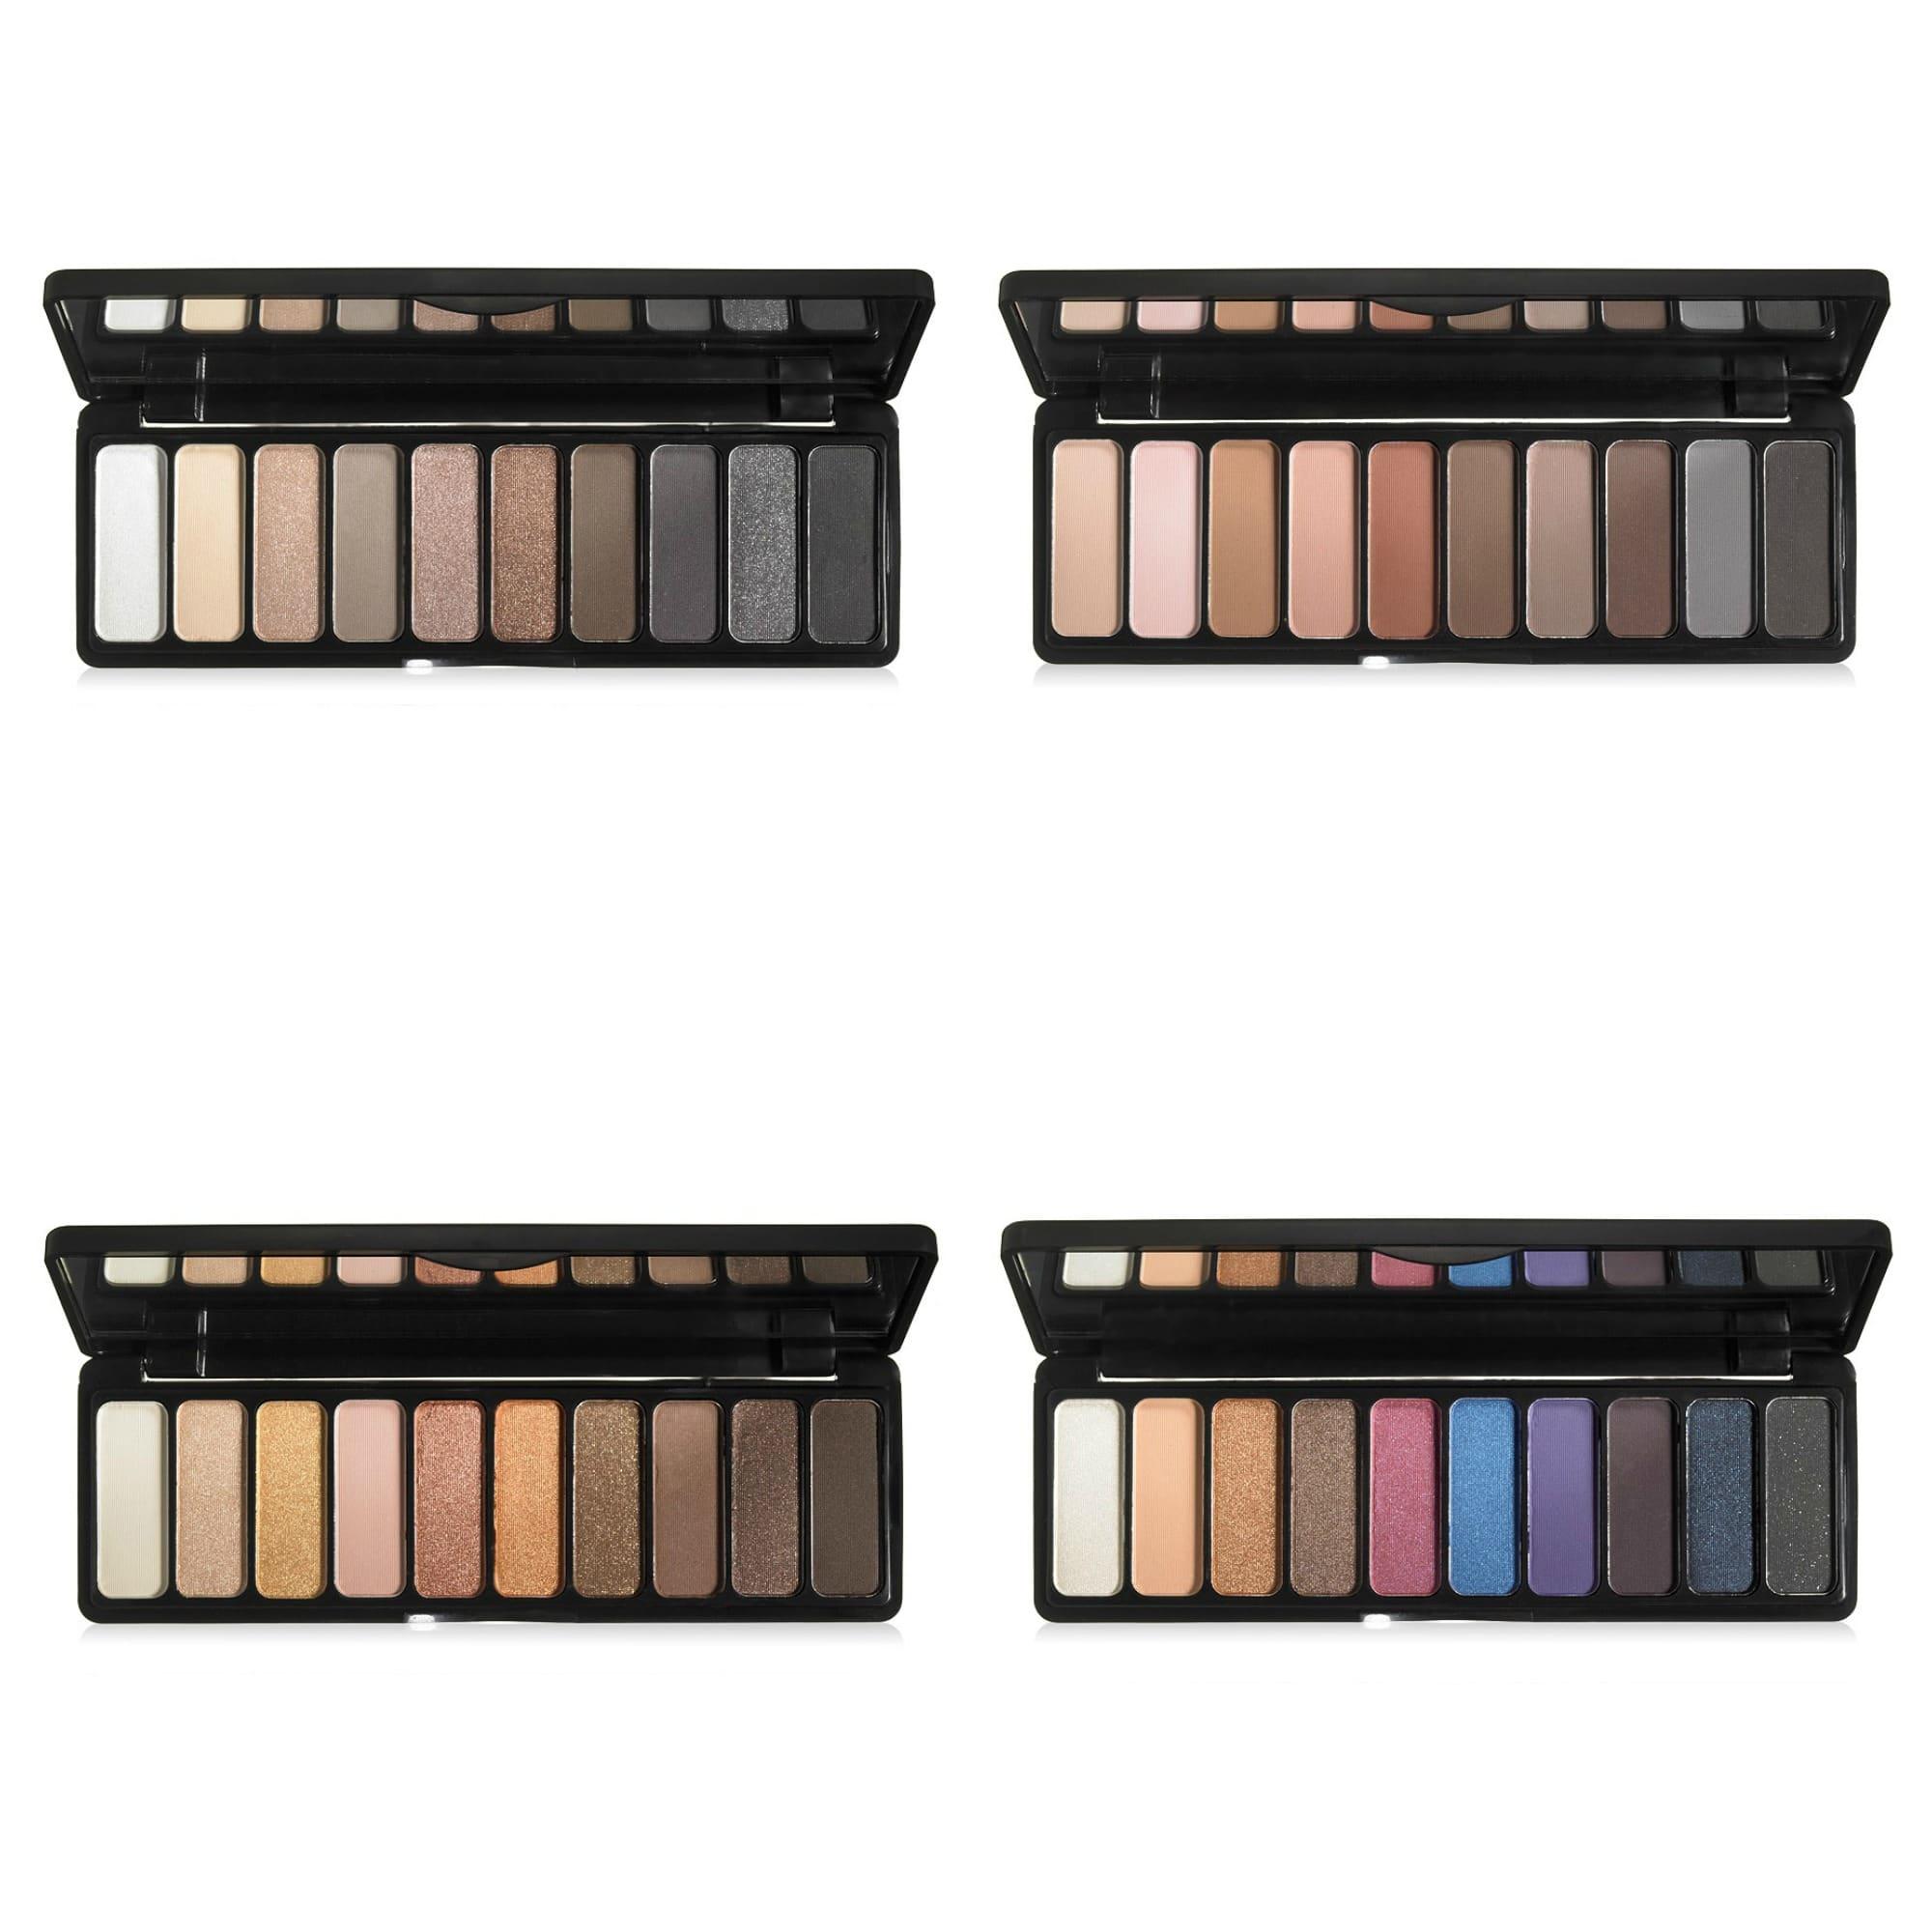 New ELF Eyeshadow Palettes